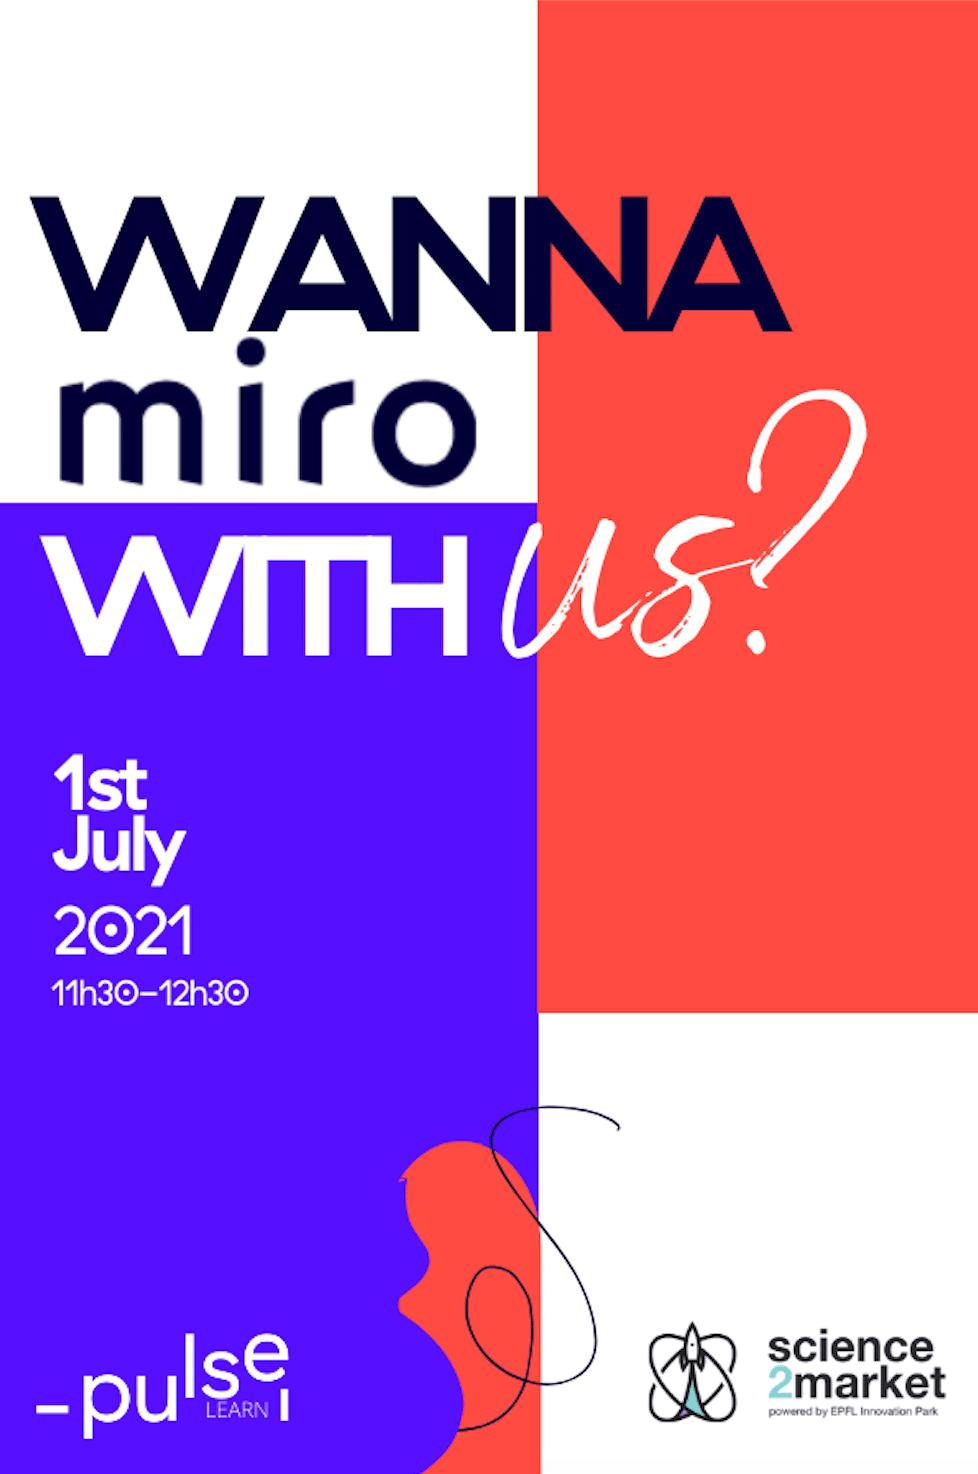 MIRO event